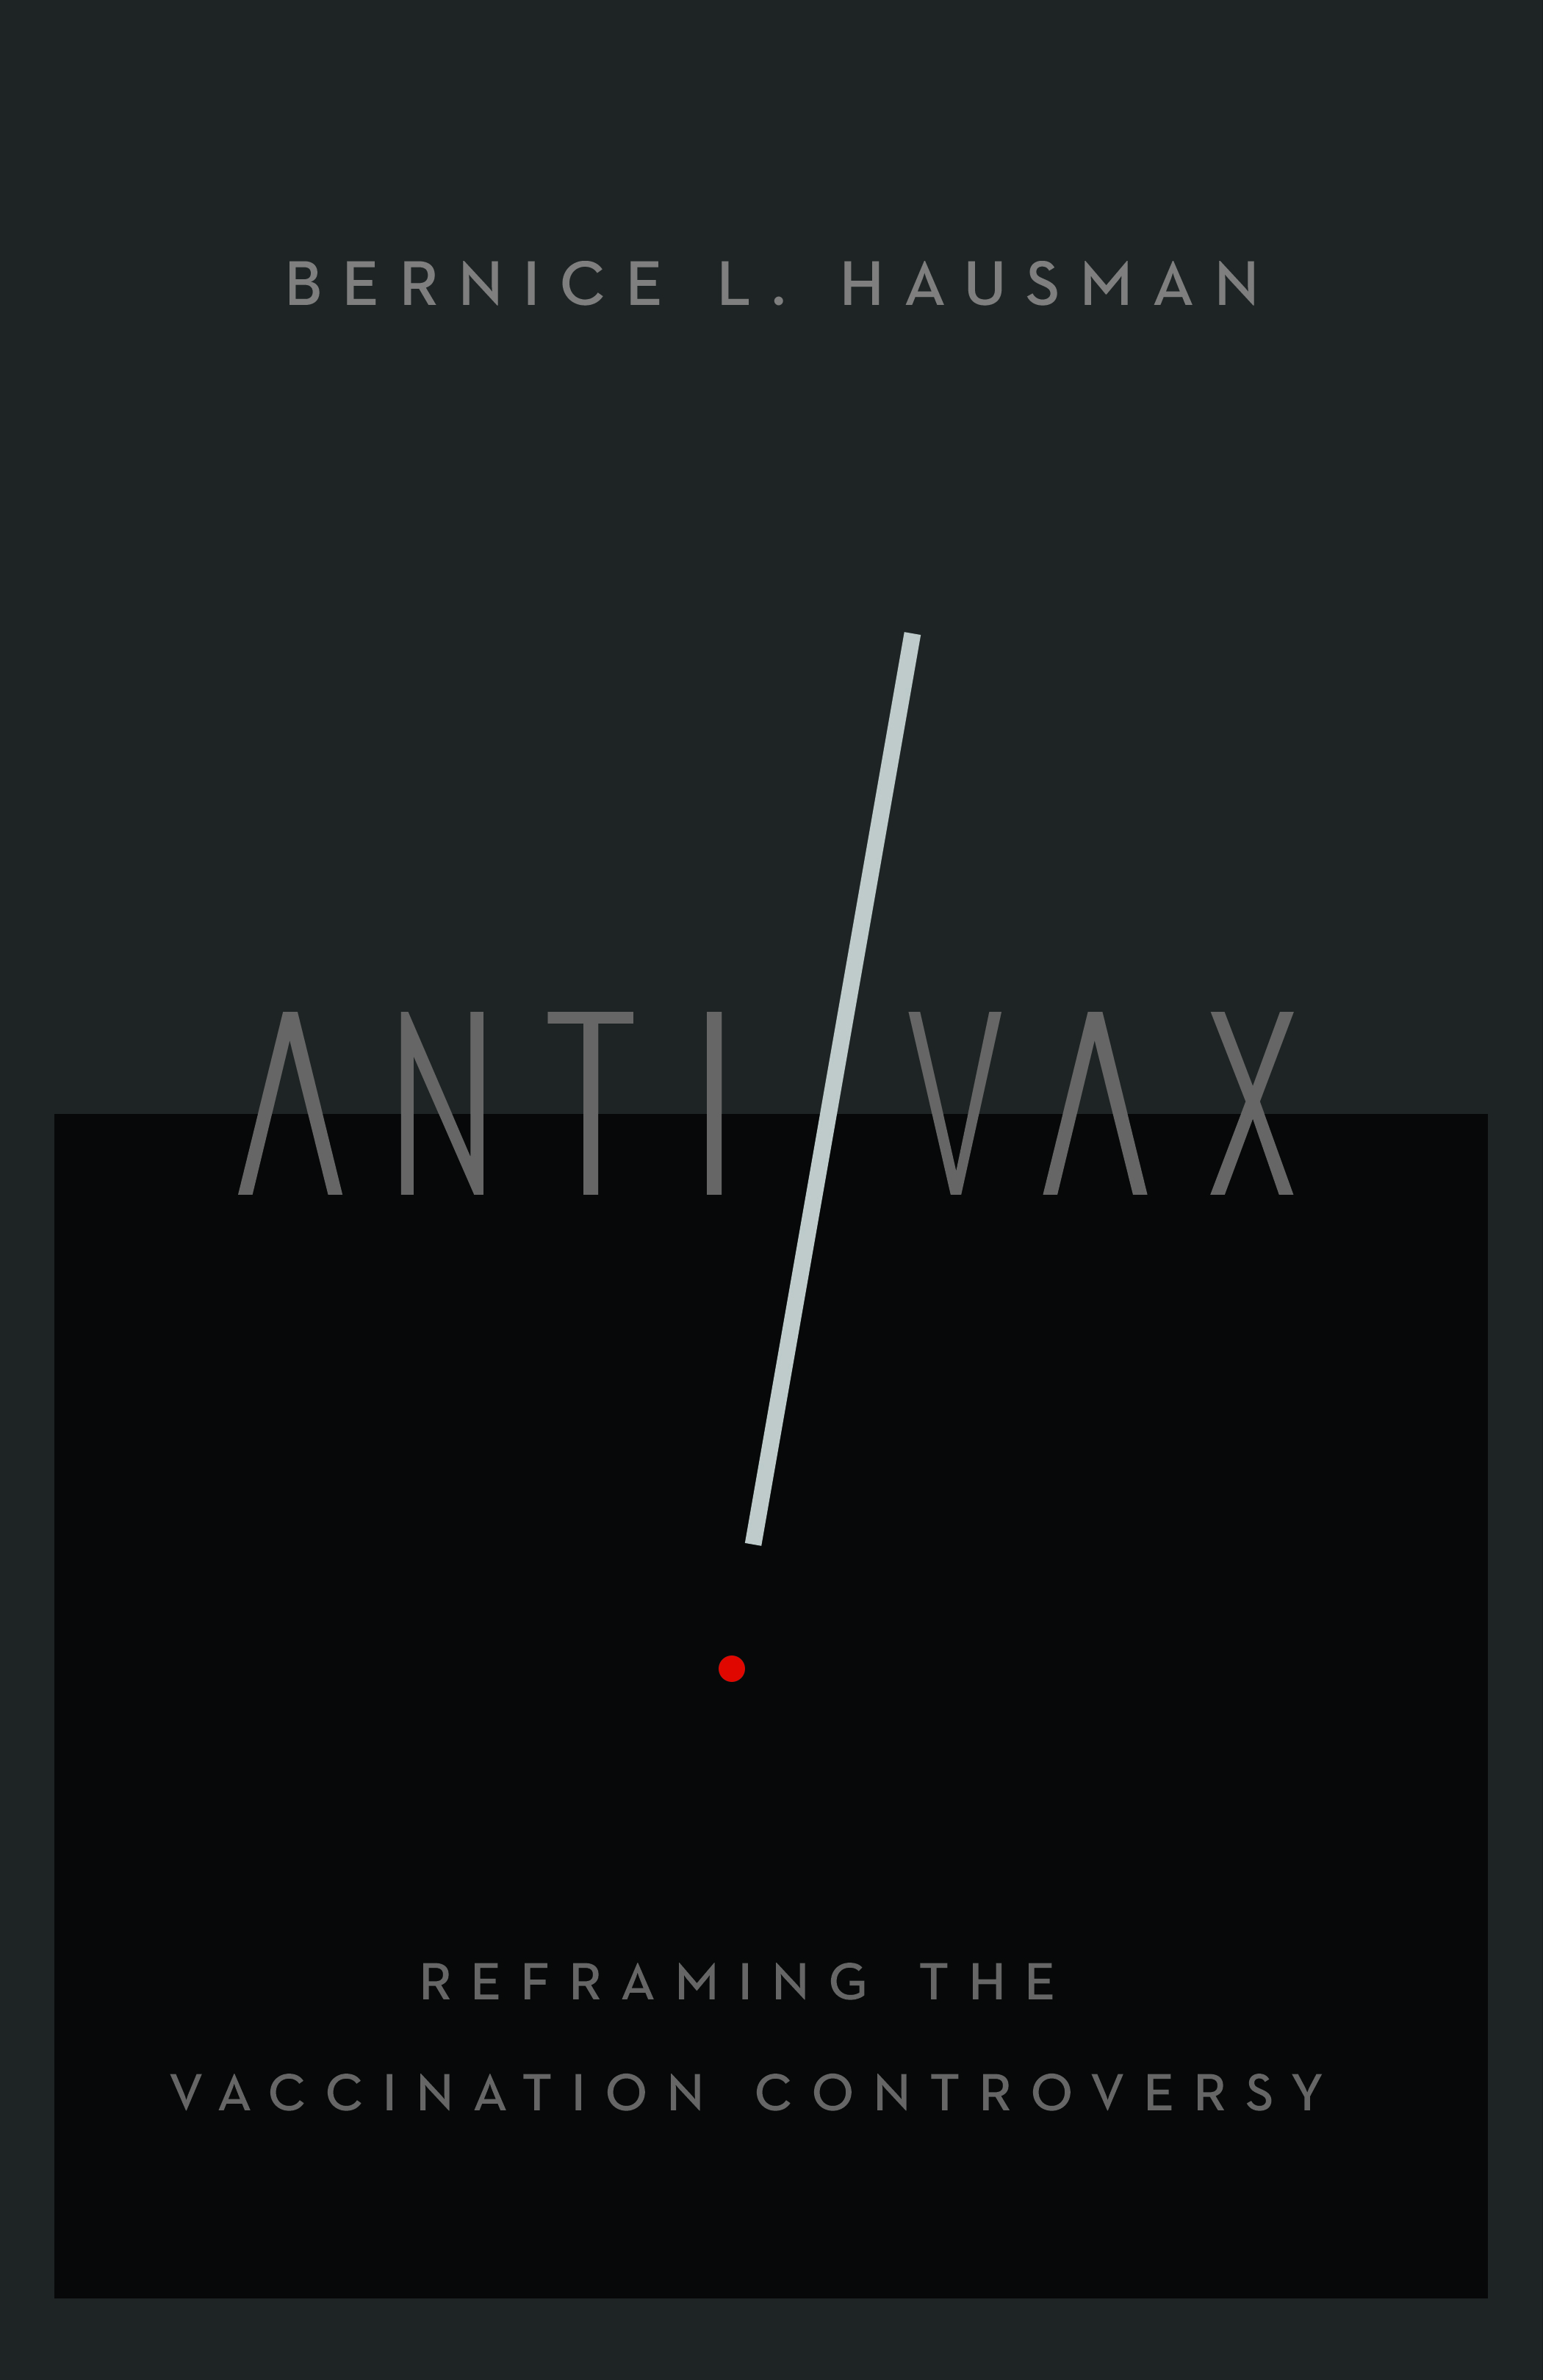 Hausmann Ant Vax S19 (1).jpg